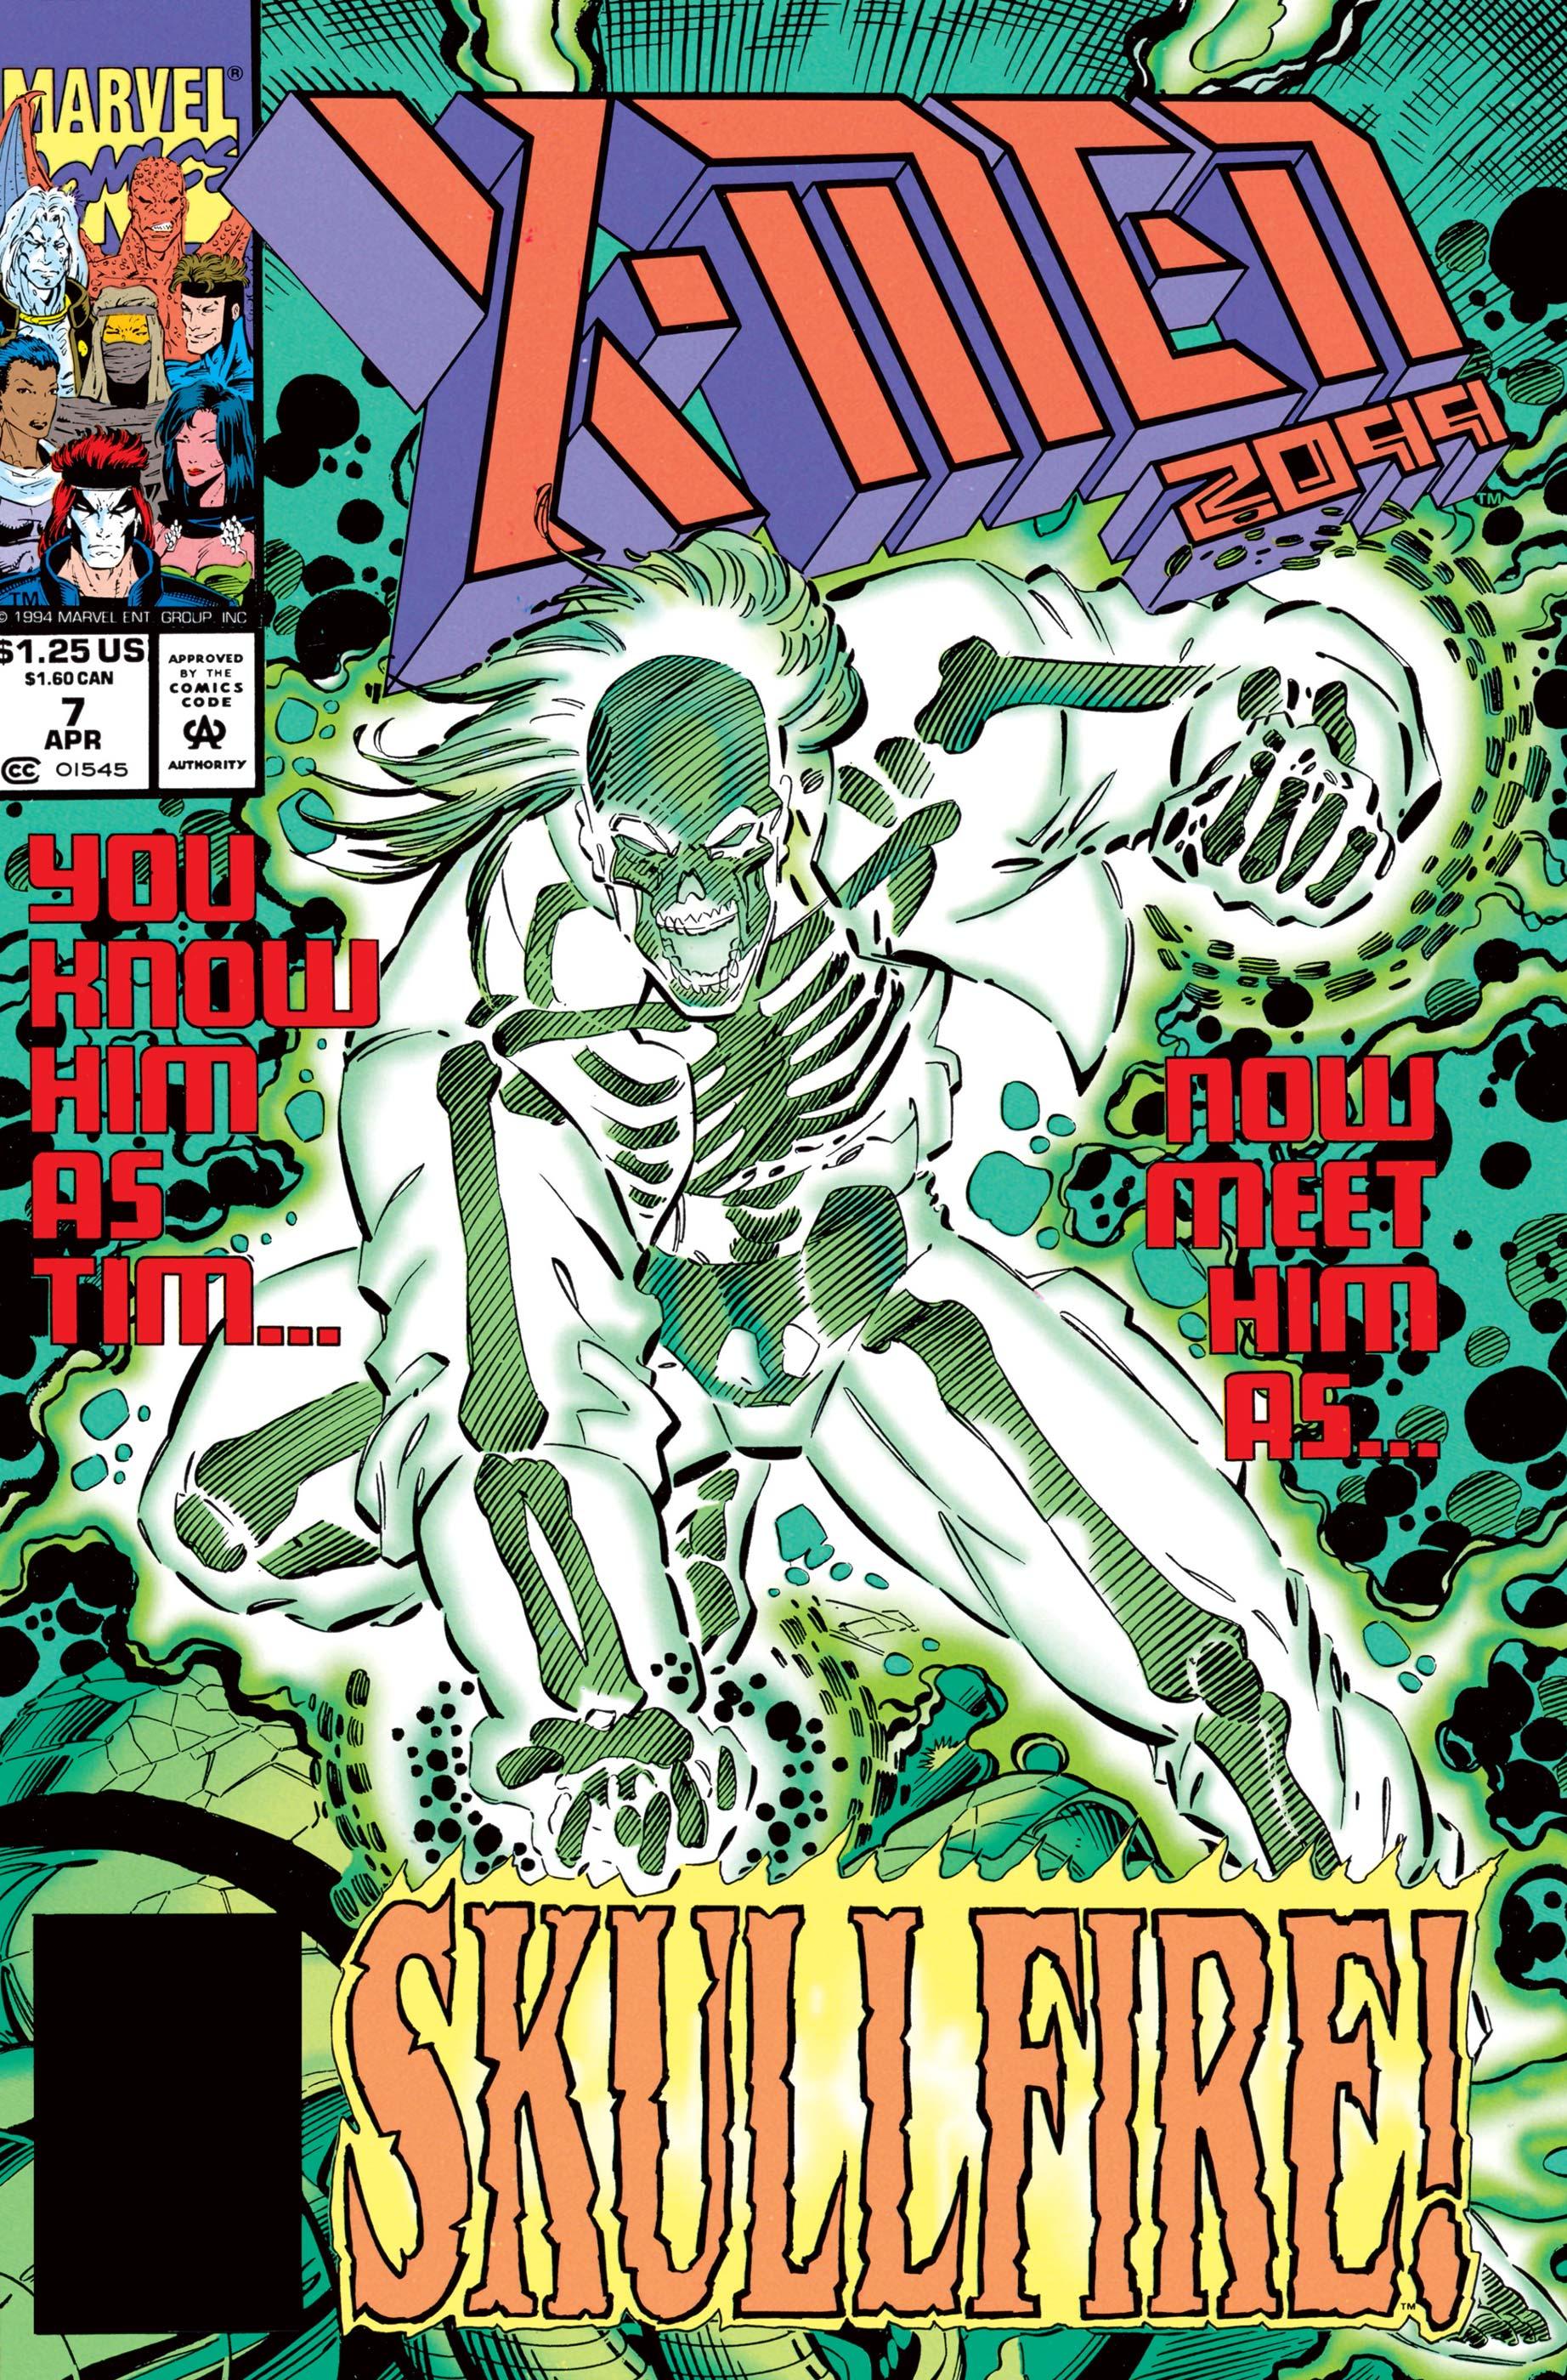 X-Men 2099 (1993) #7